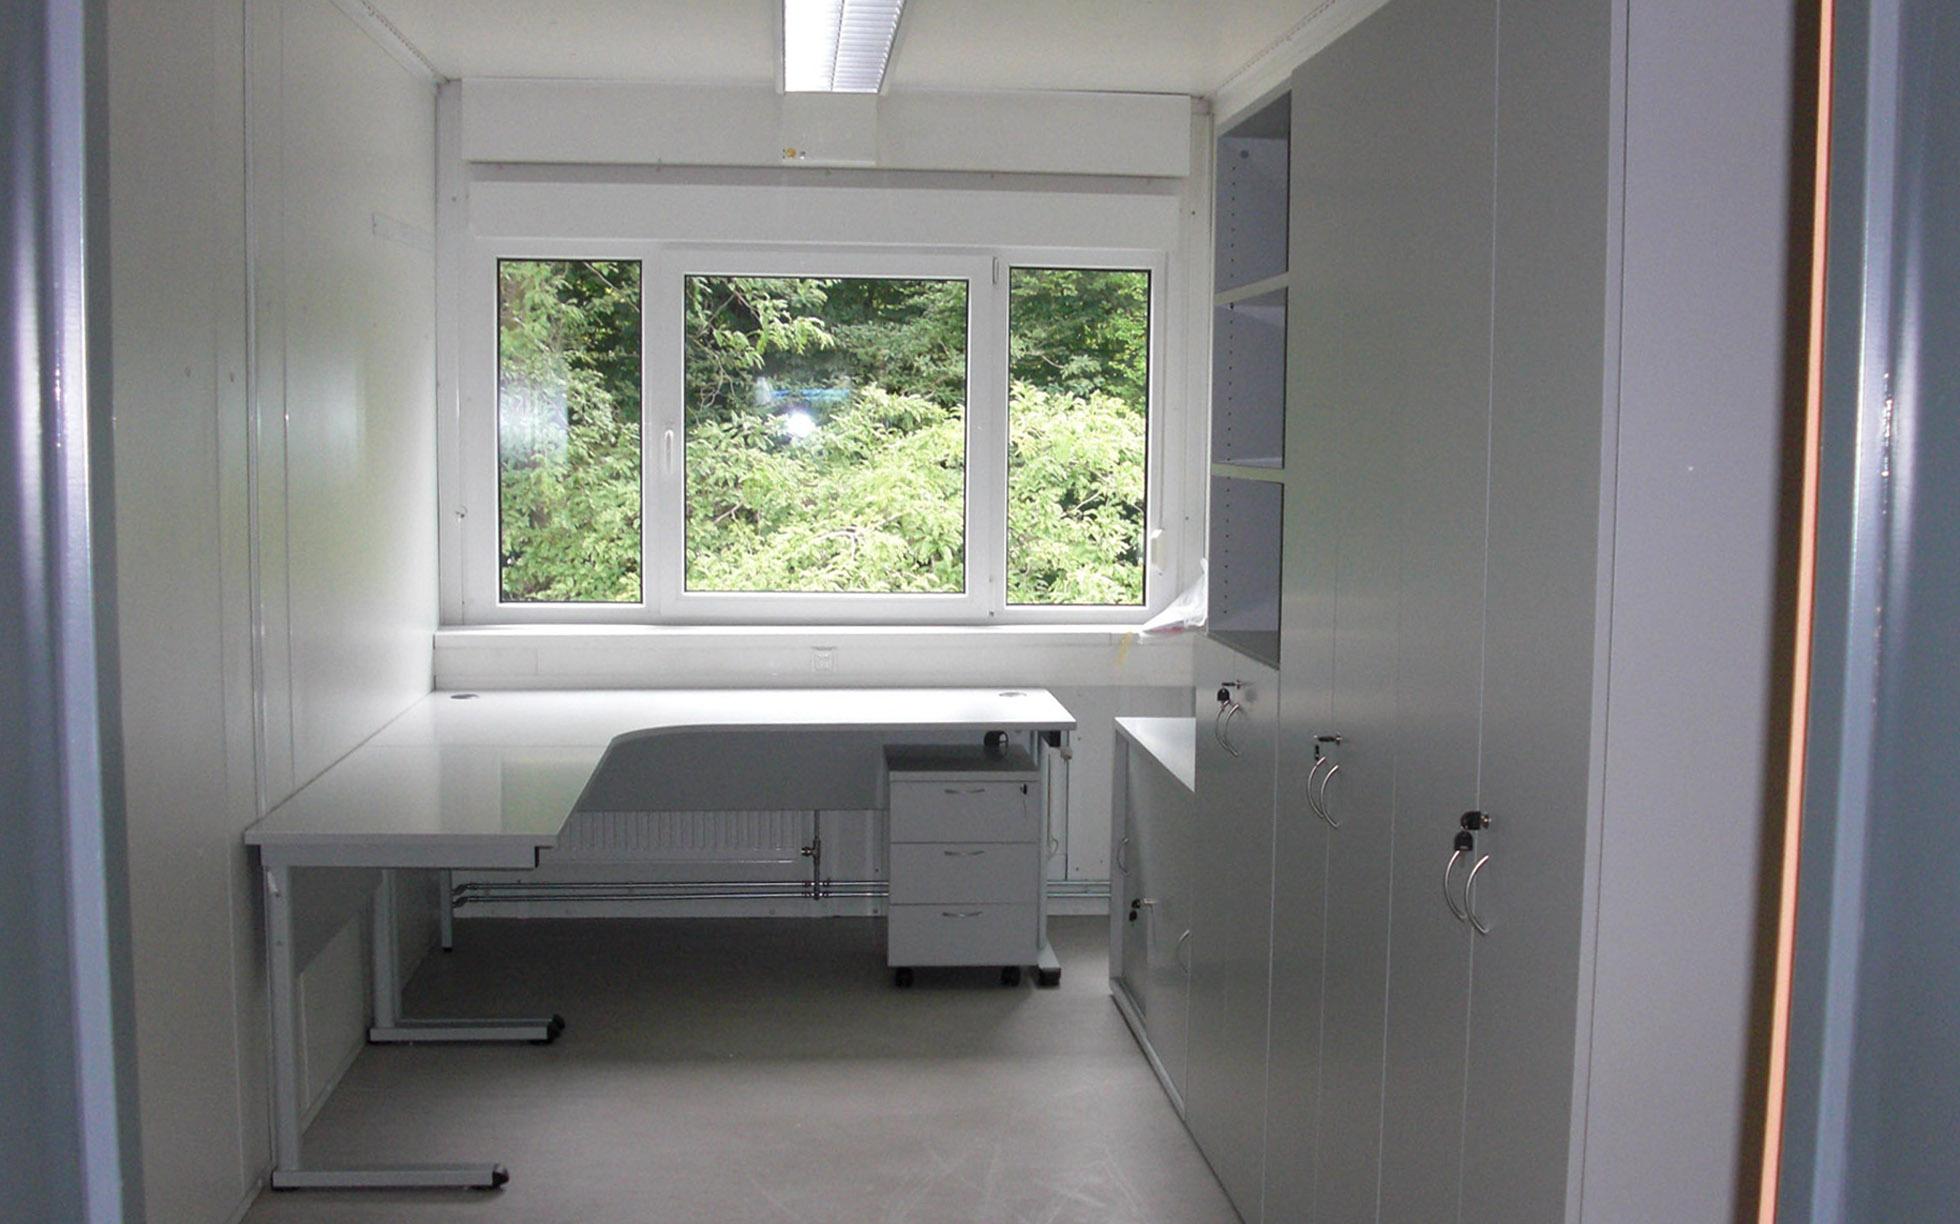 containerbauten baubaracken. Black Bedroom Furniture Sets. Home Design Ideas